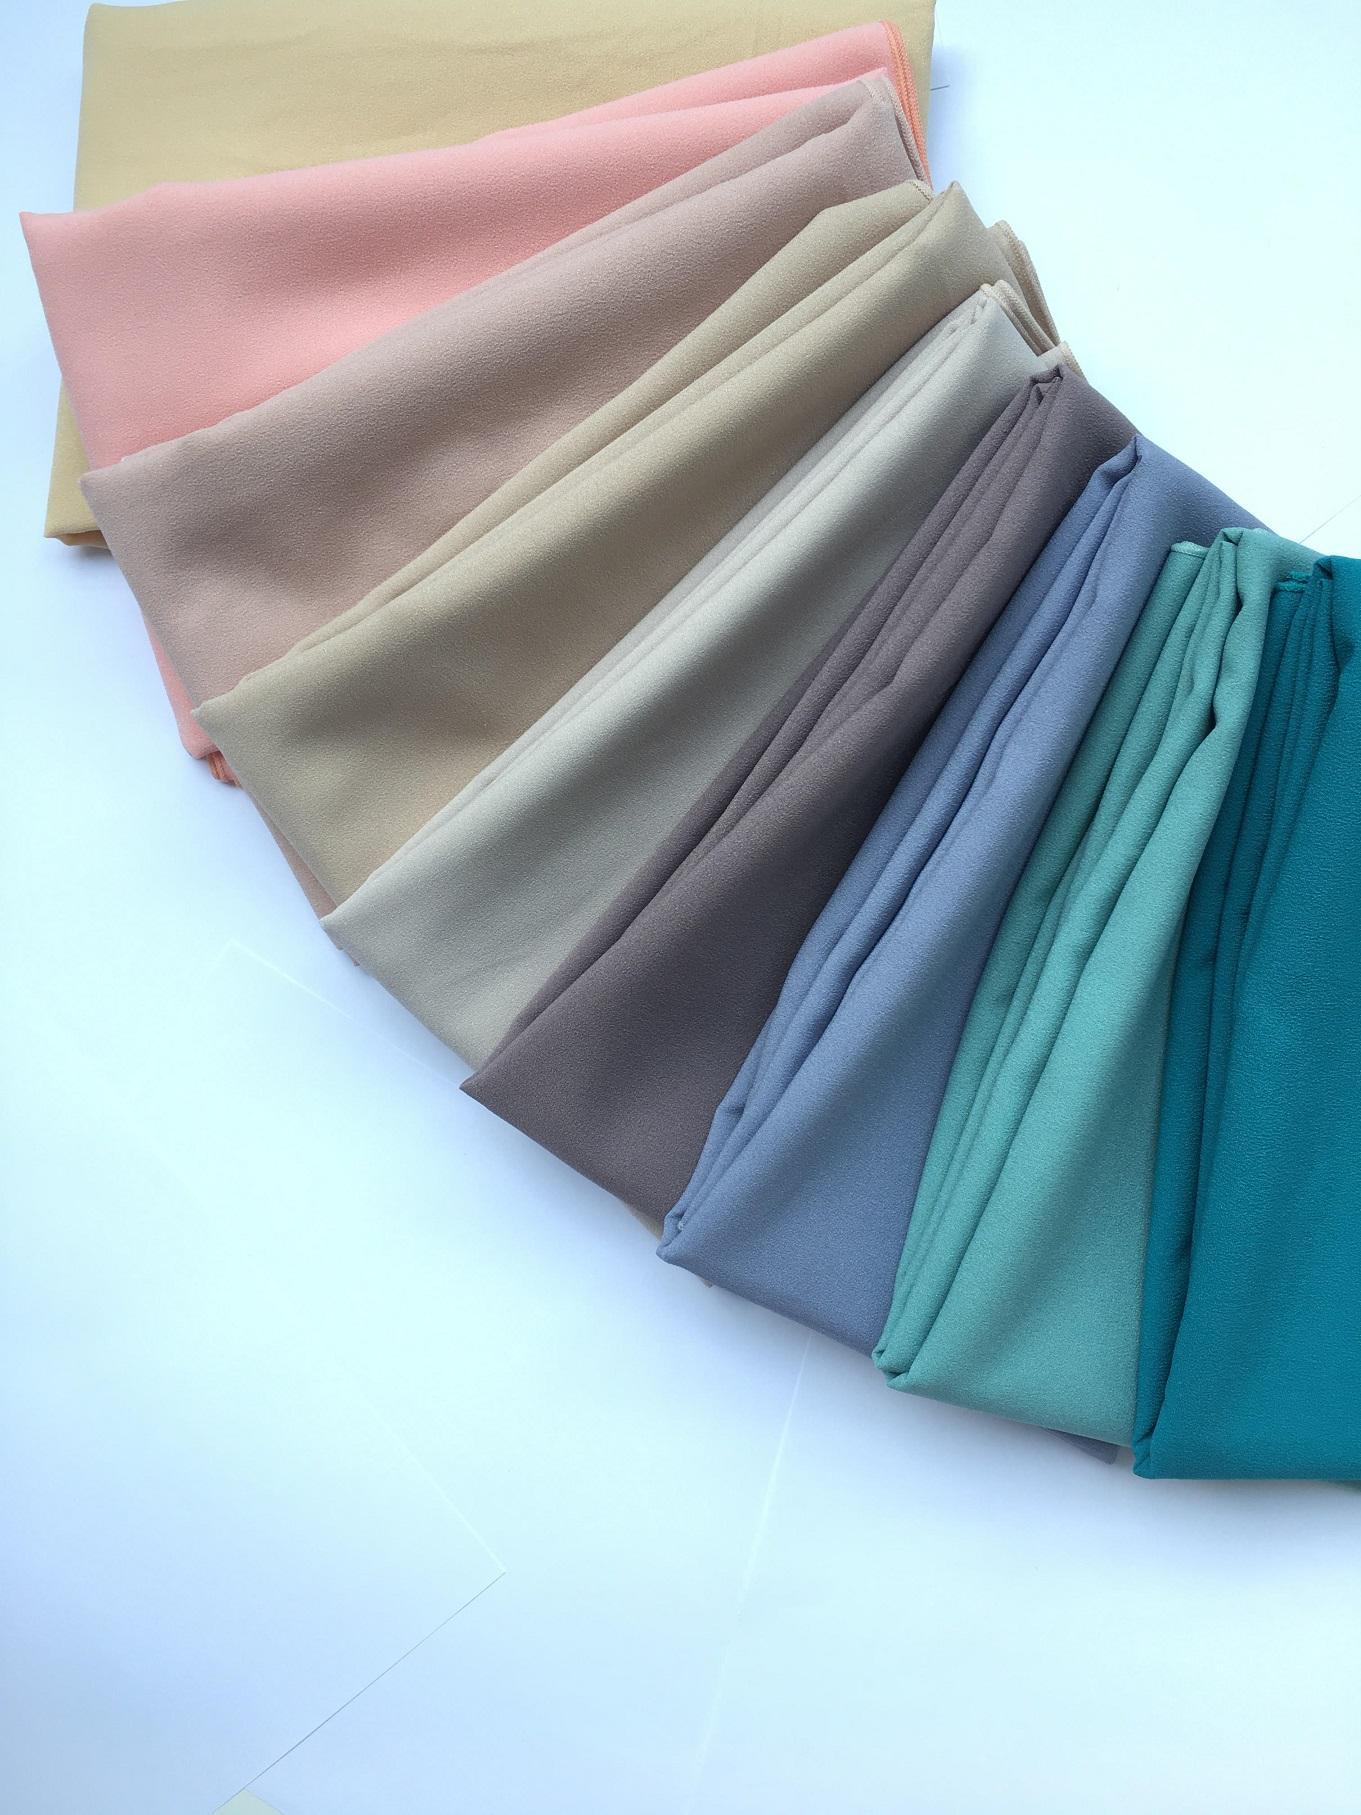 Detail Gambar Hijab Pashmina / Jilbab Pasmina / Kerudung Pashmina / Pashmina Sabyan / Pashmina Diamond Stretch - Suryani Collection Terbaru